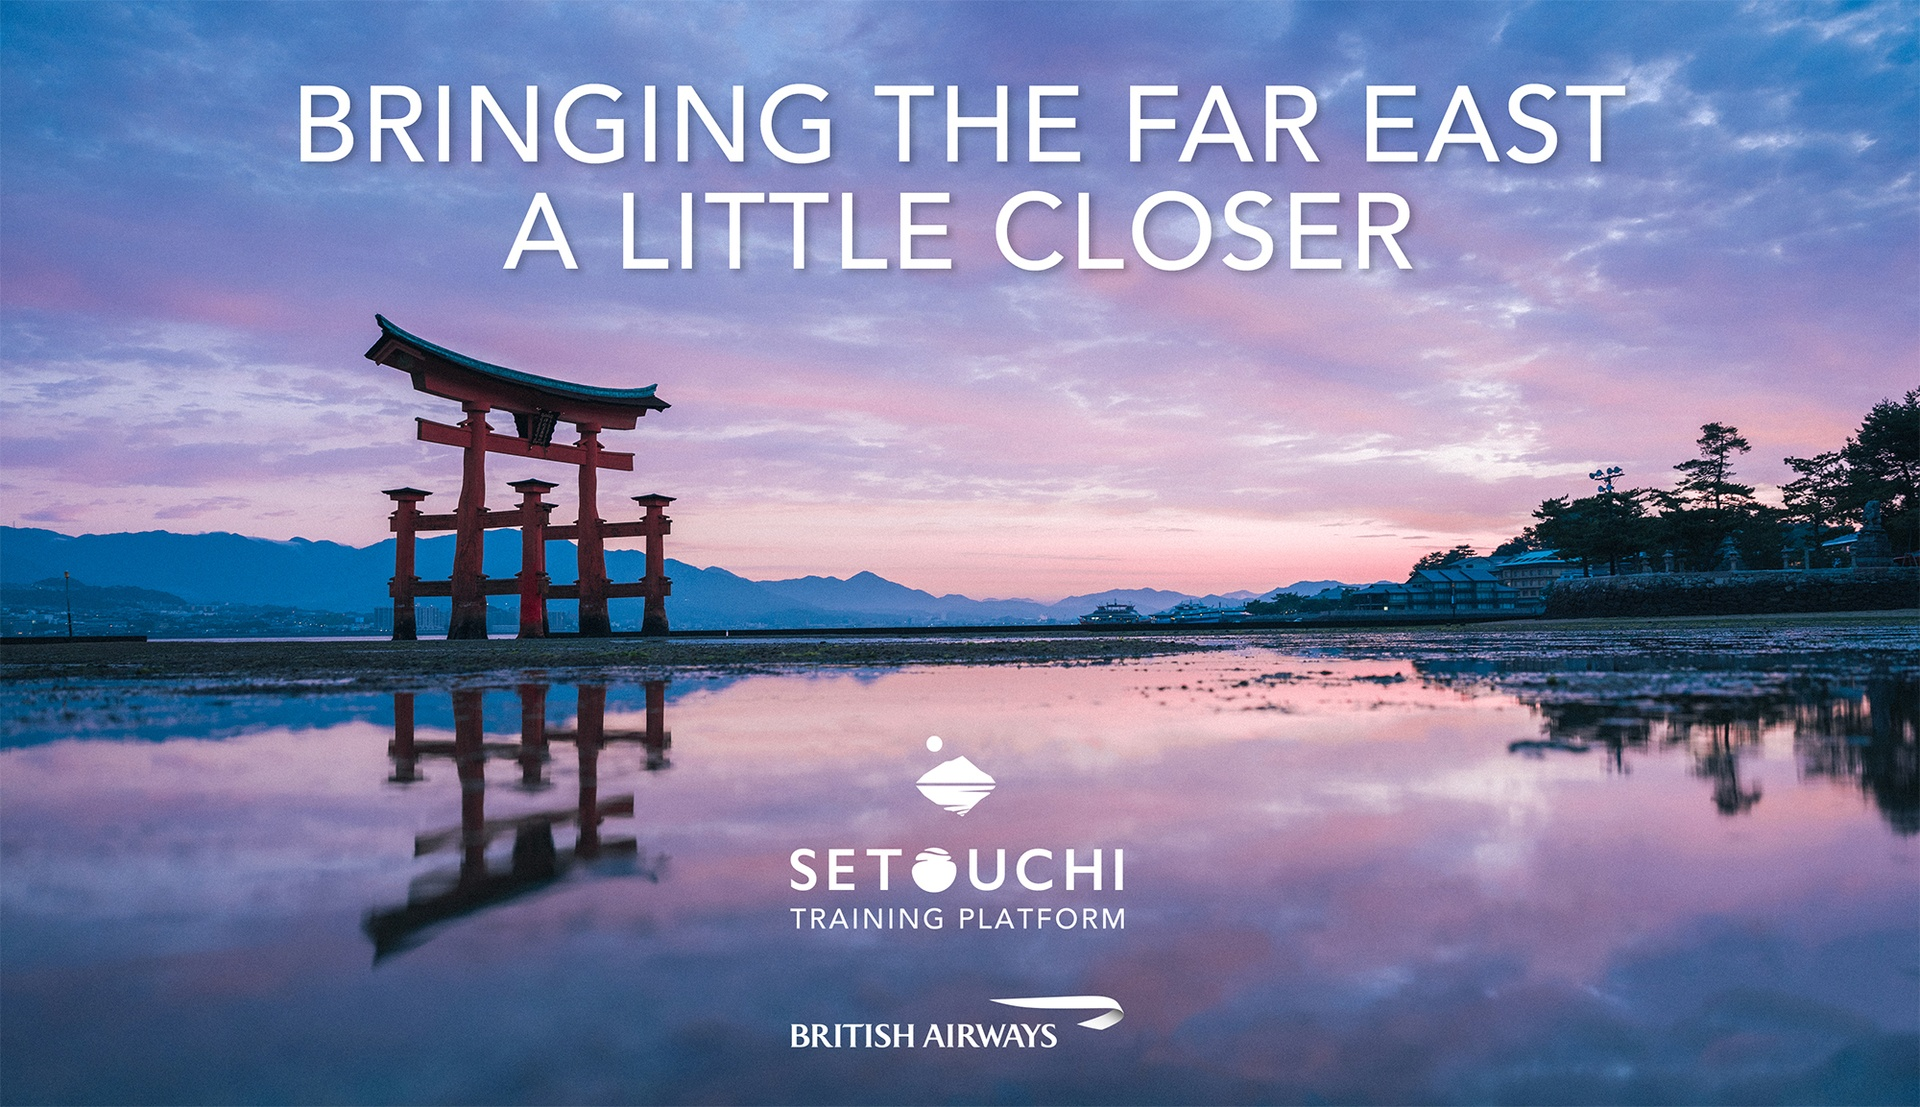 <p>UK and Ireland Incentive - Win a trip to Setouchi, Japan</p>